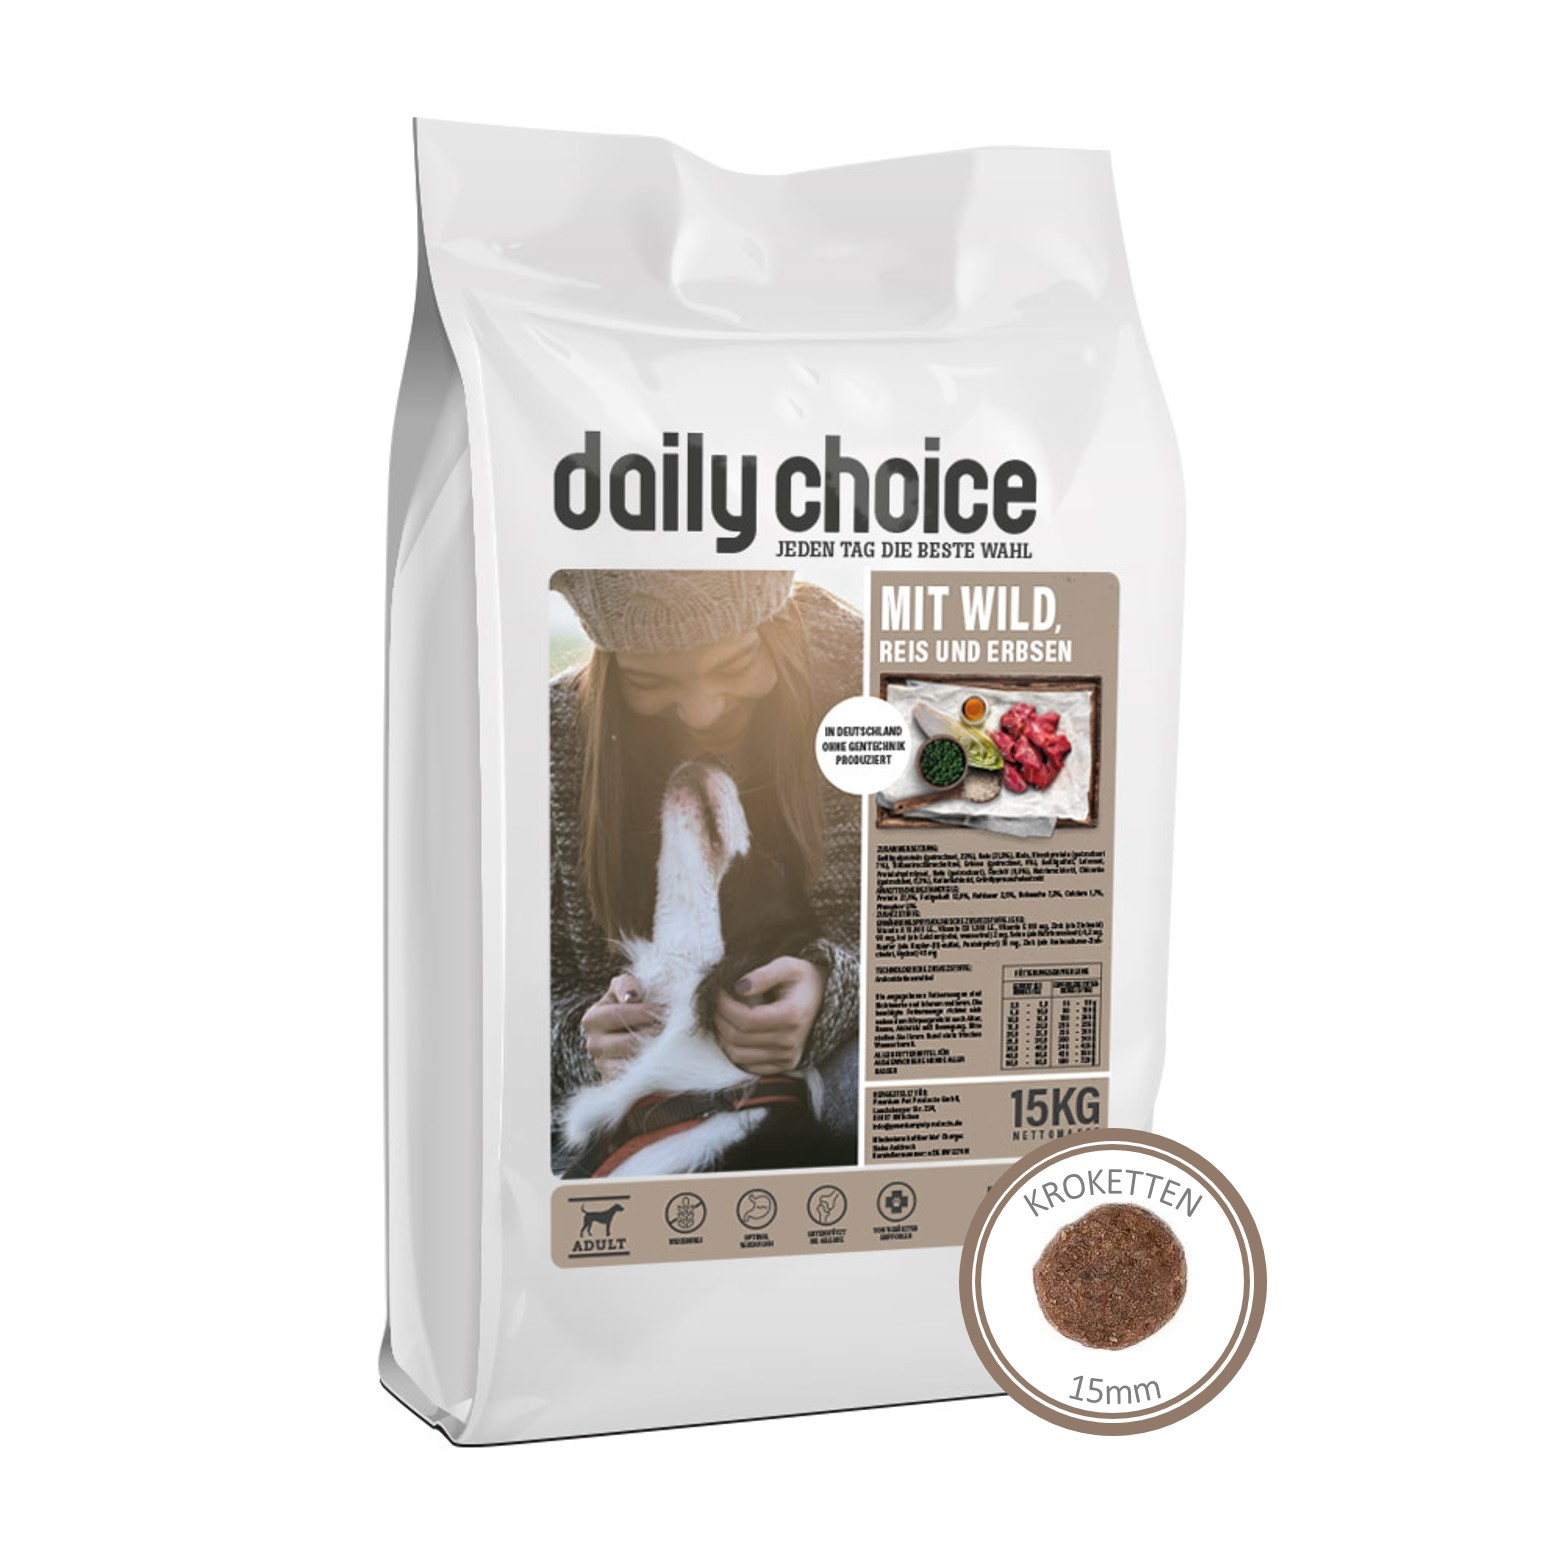 daily choice basic mit Wild